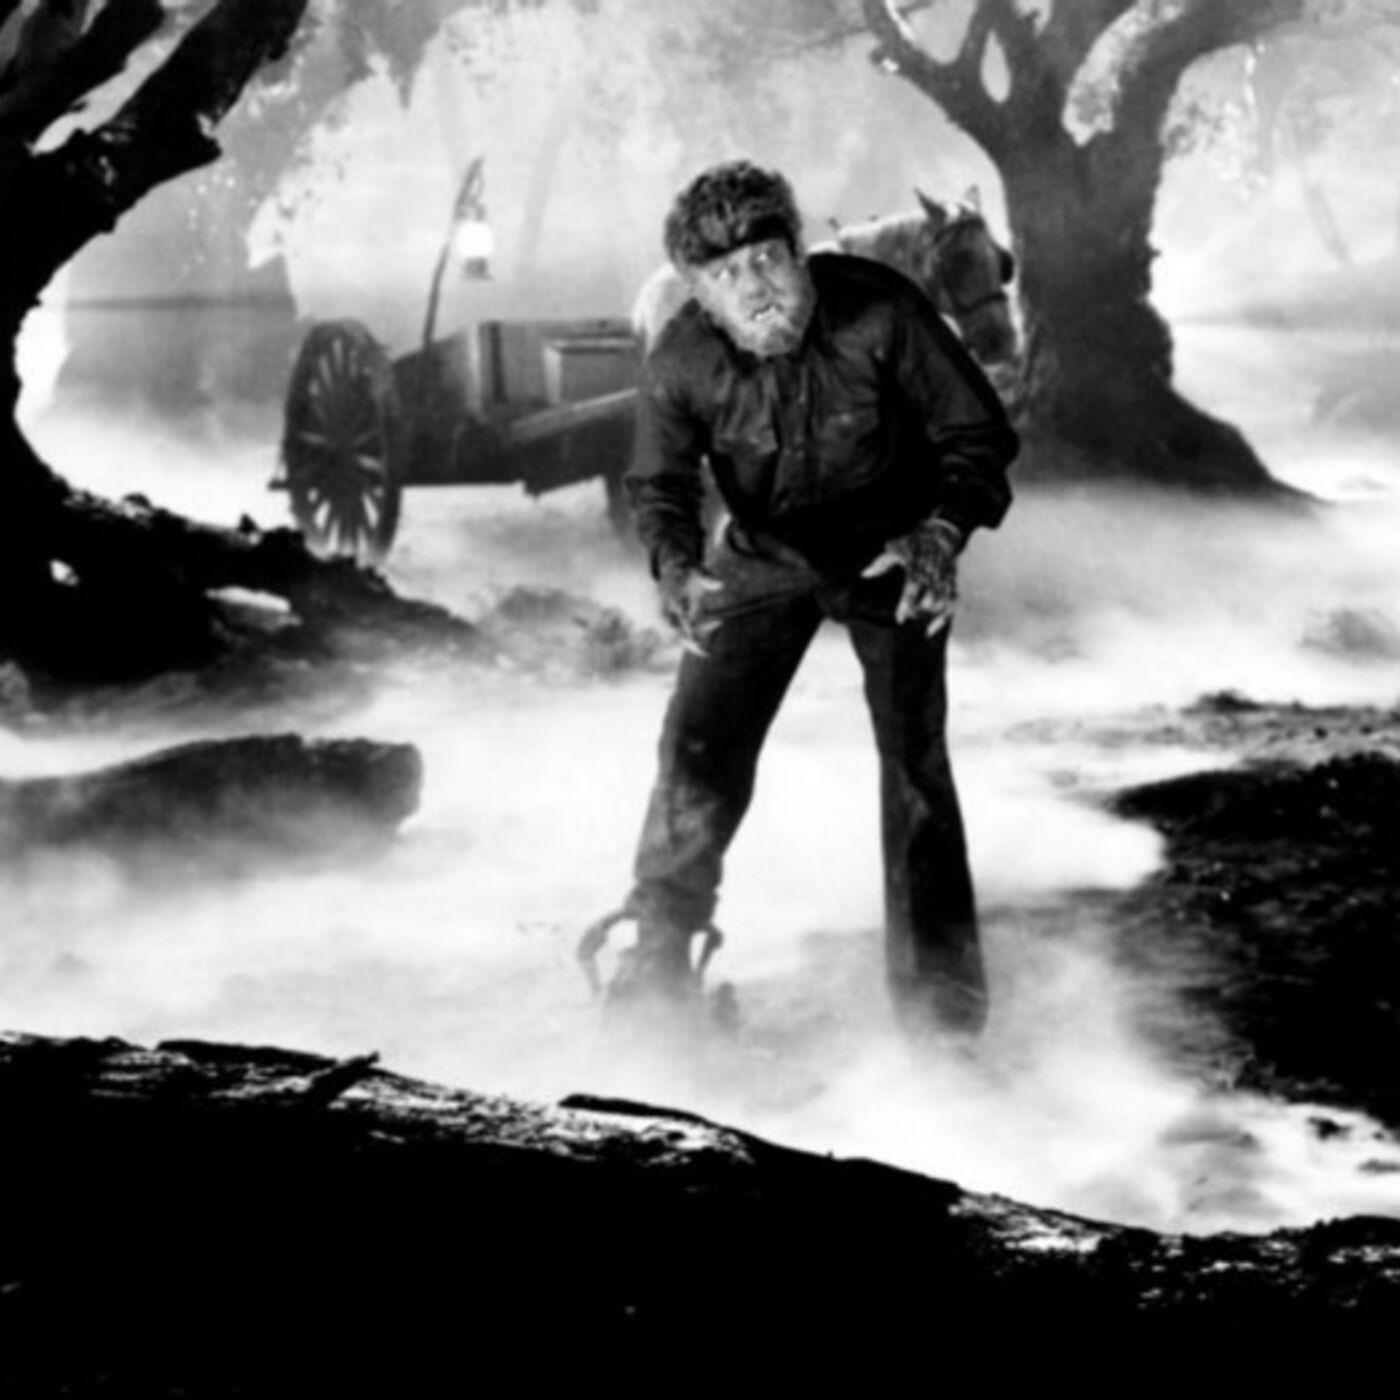 31 Days of Halloween: The Wolf Man